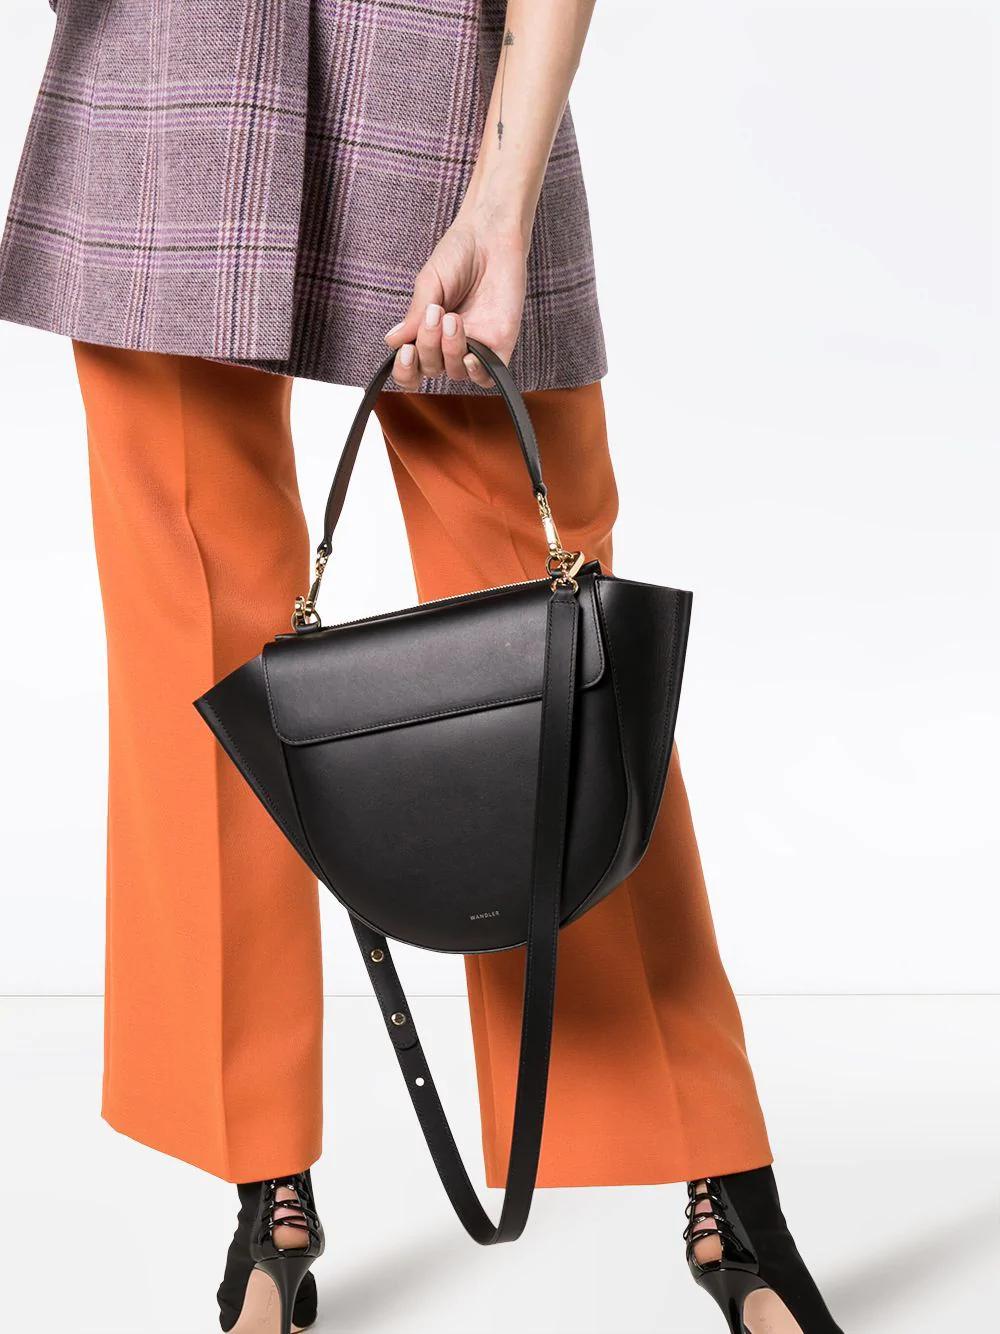 New Womens Stylish Design Medium Tote Handbag Shopper Messenger Shoulder Bag